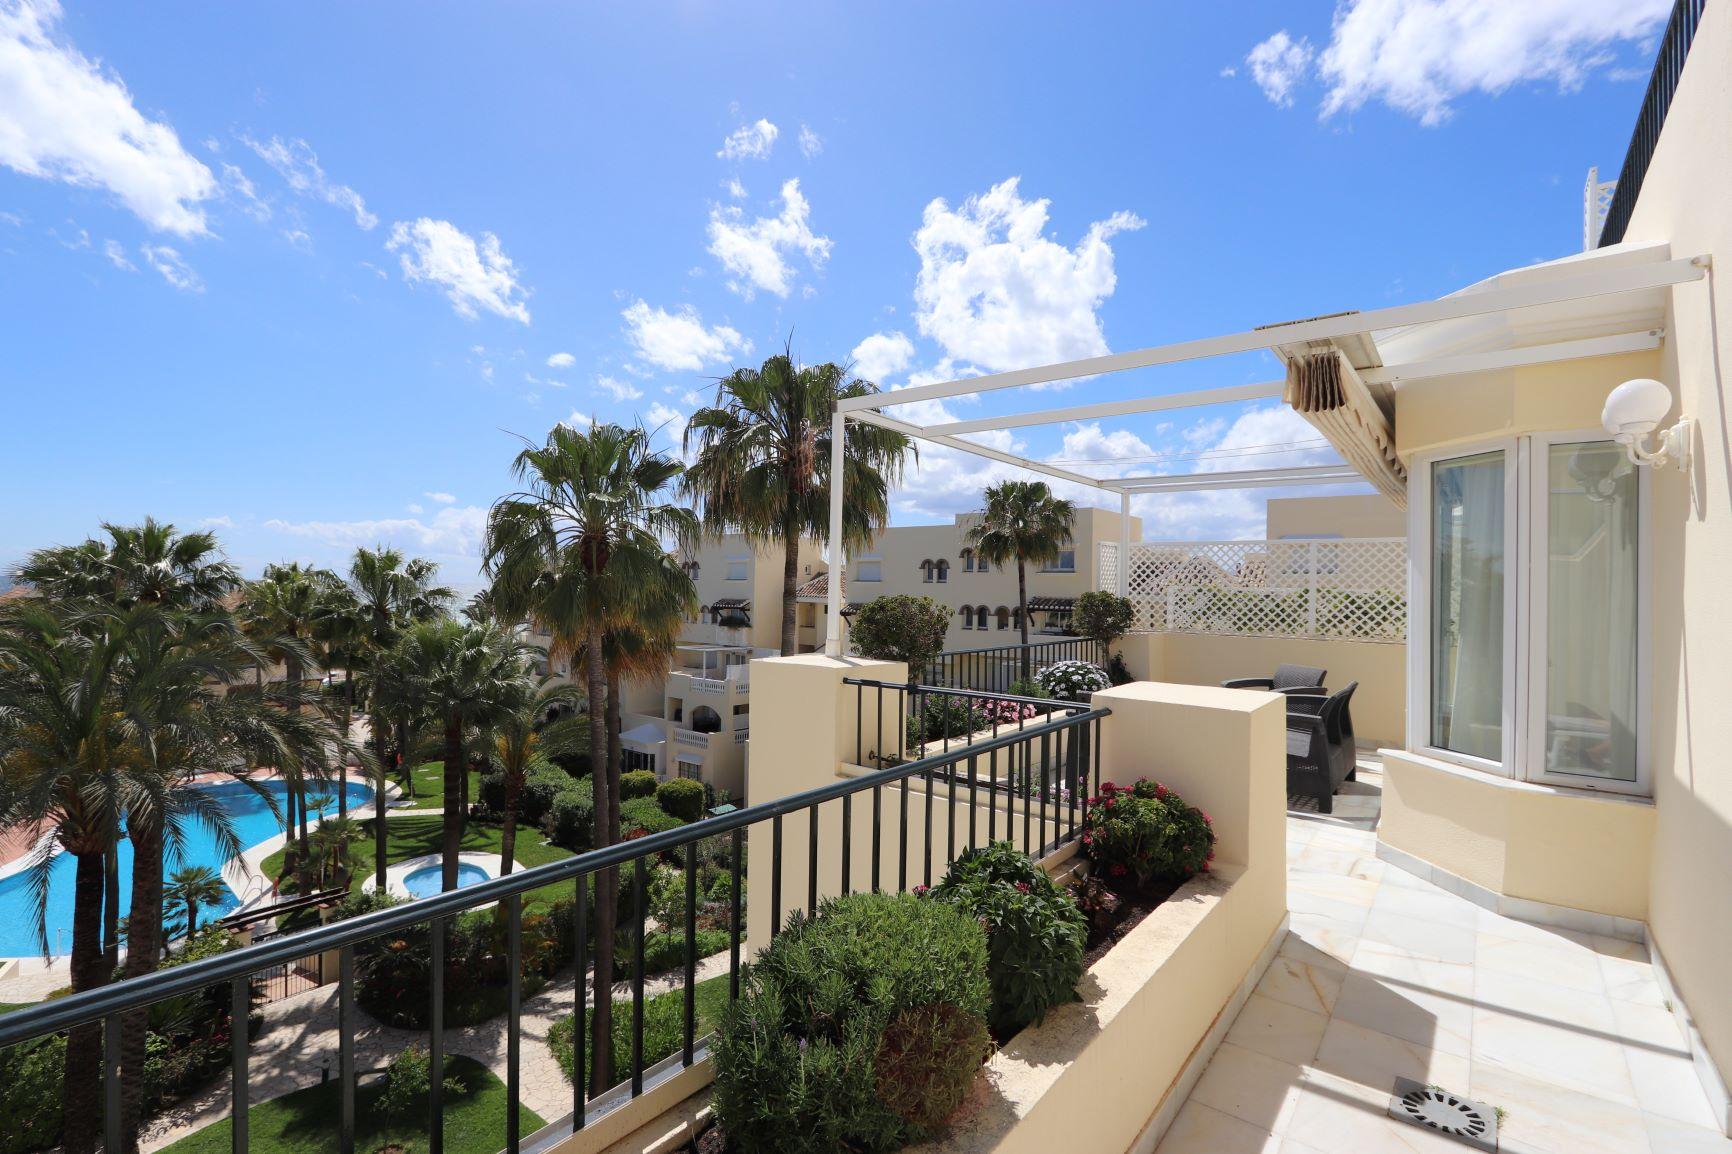 Penthouse for sale in Elviria, Beachfront